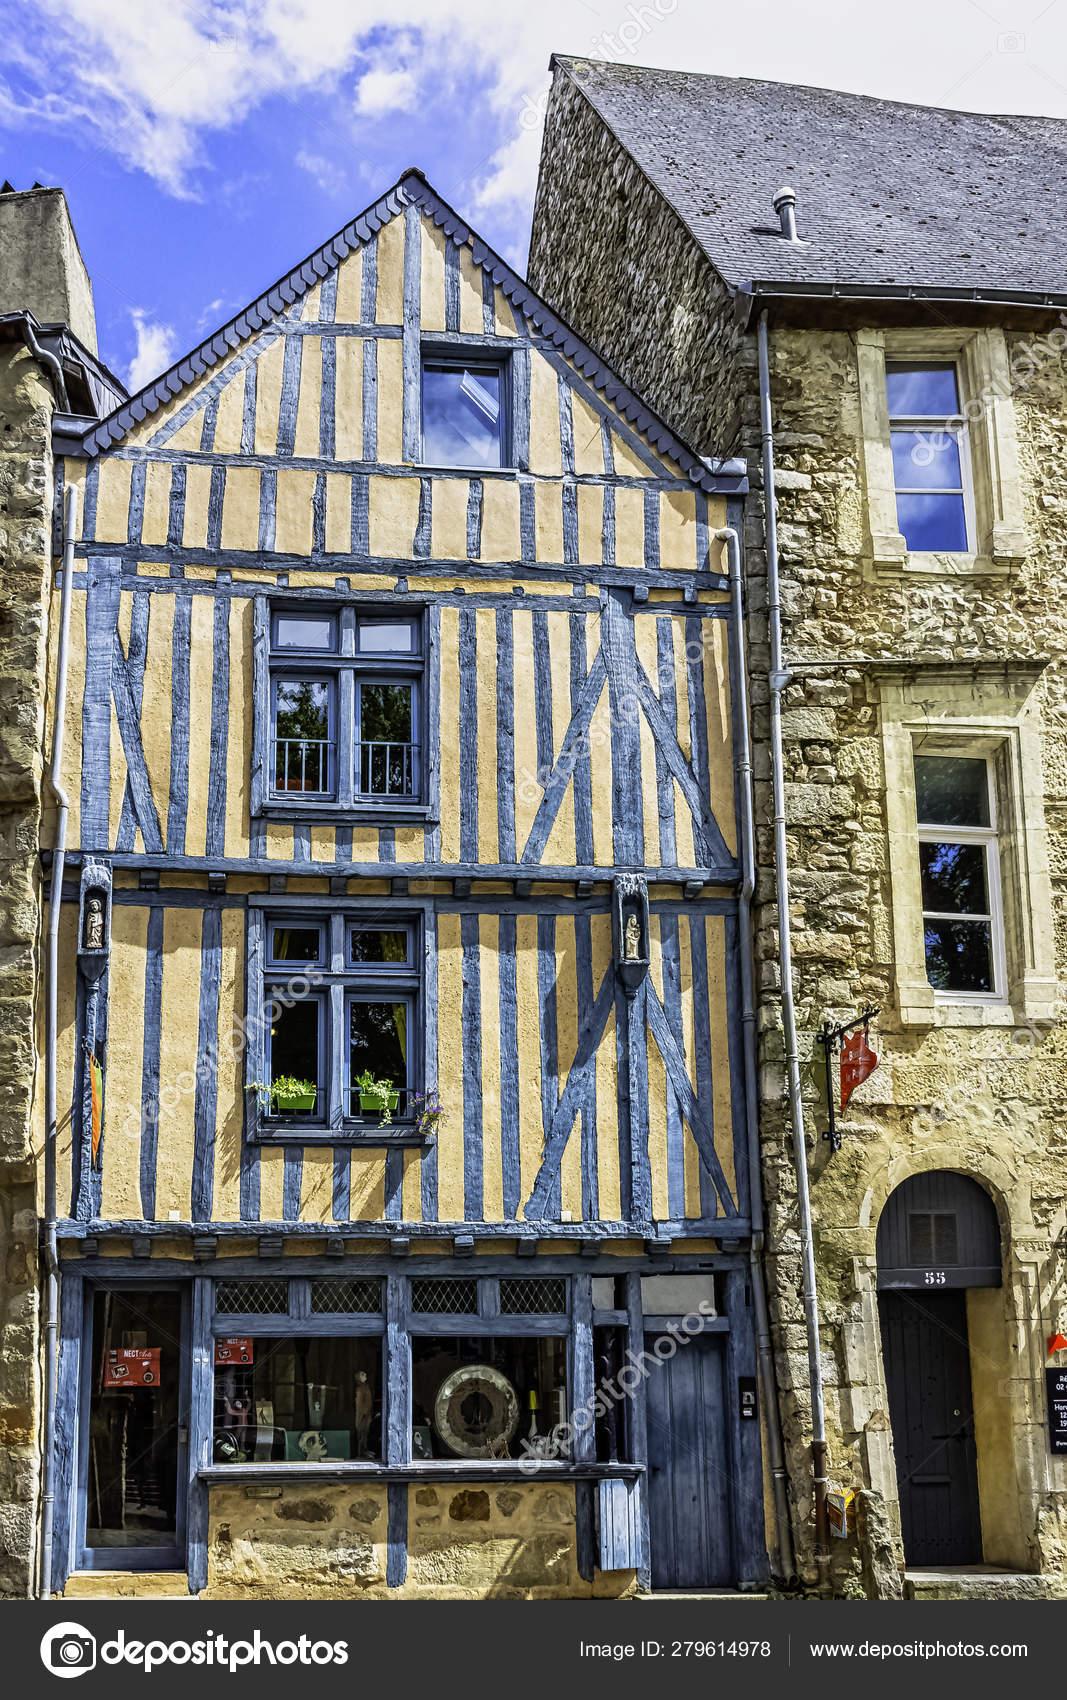 Architecte Le Mans vintage architecture old town mans maine france may 2019